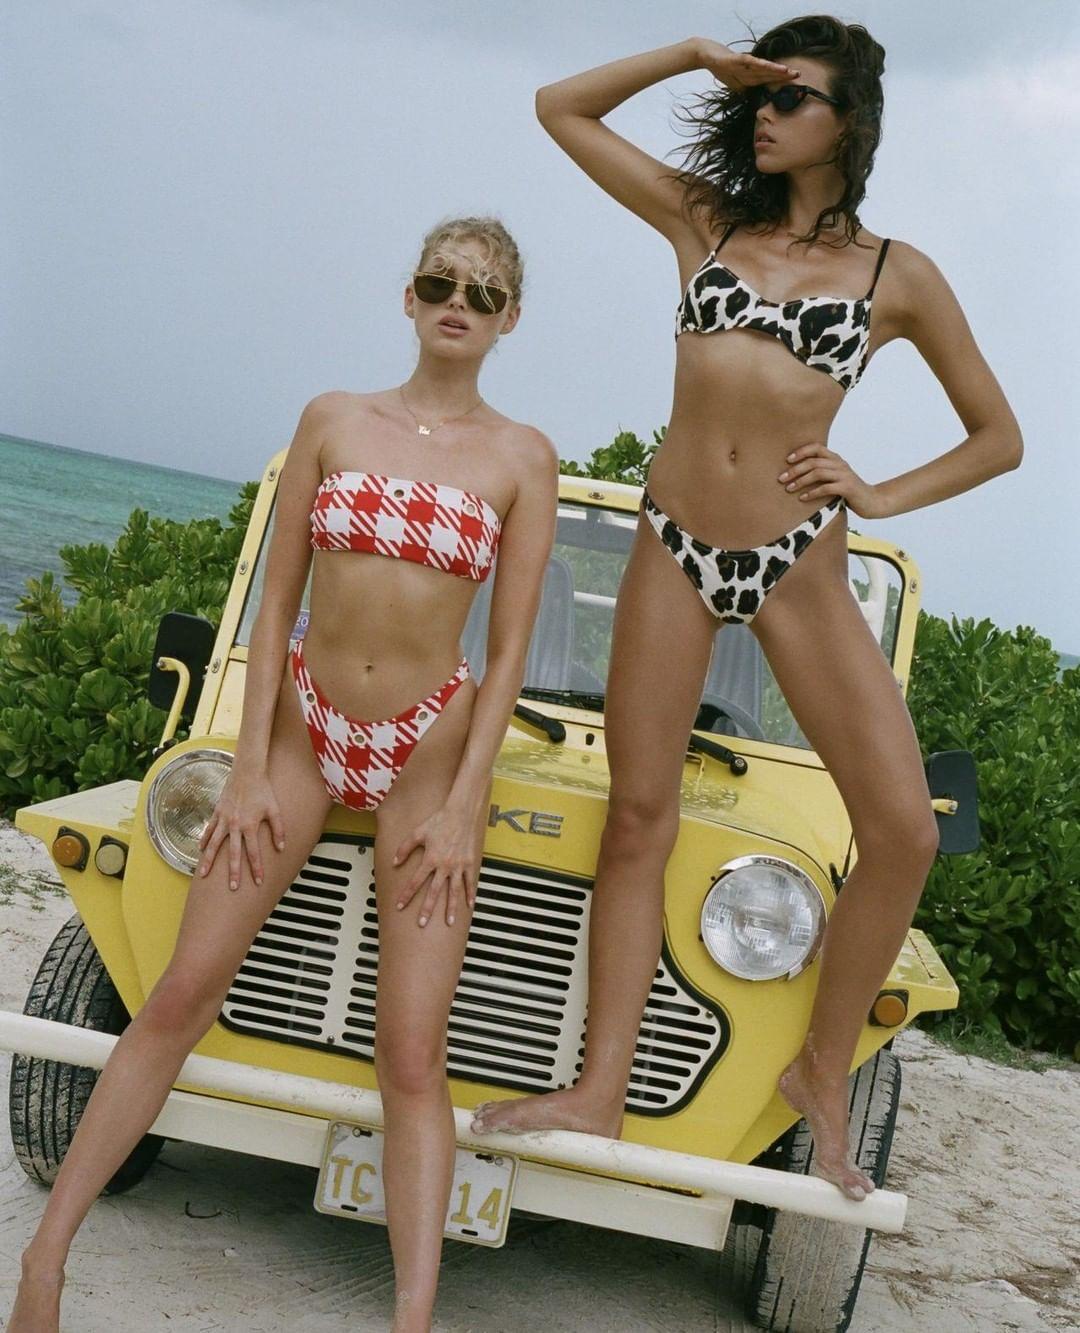 Bikini Season: Δεν μπορούμε να φανταστούμε το καλοκαίρι μας χωρίς ένα μπικίνι